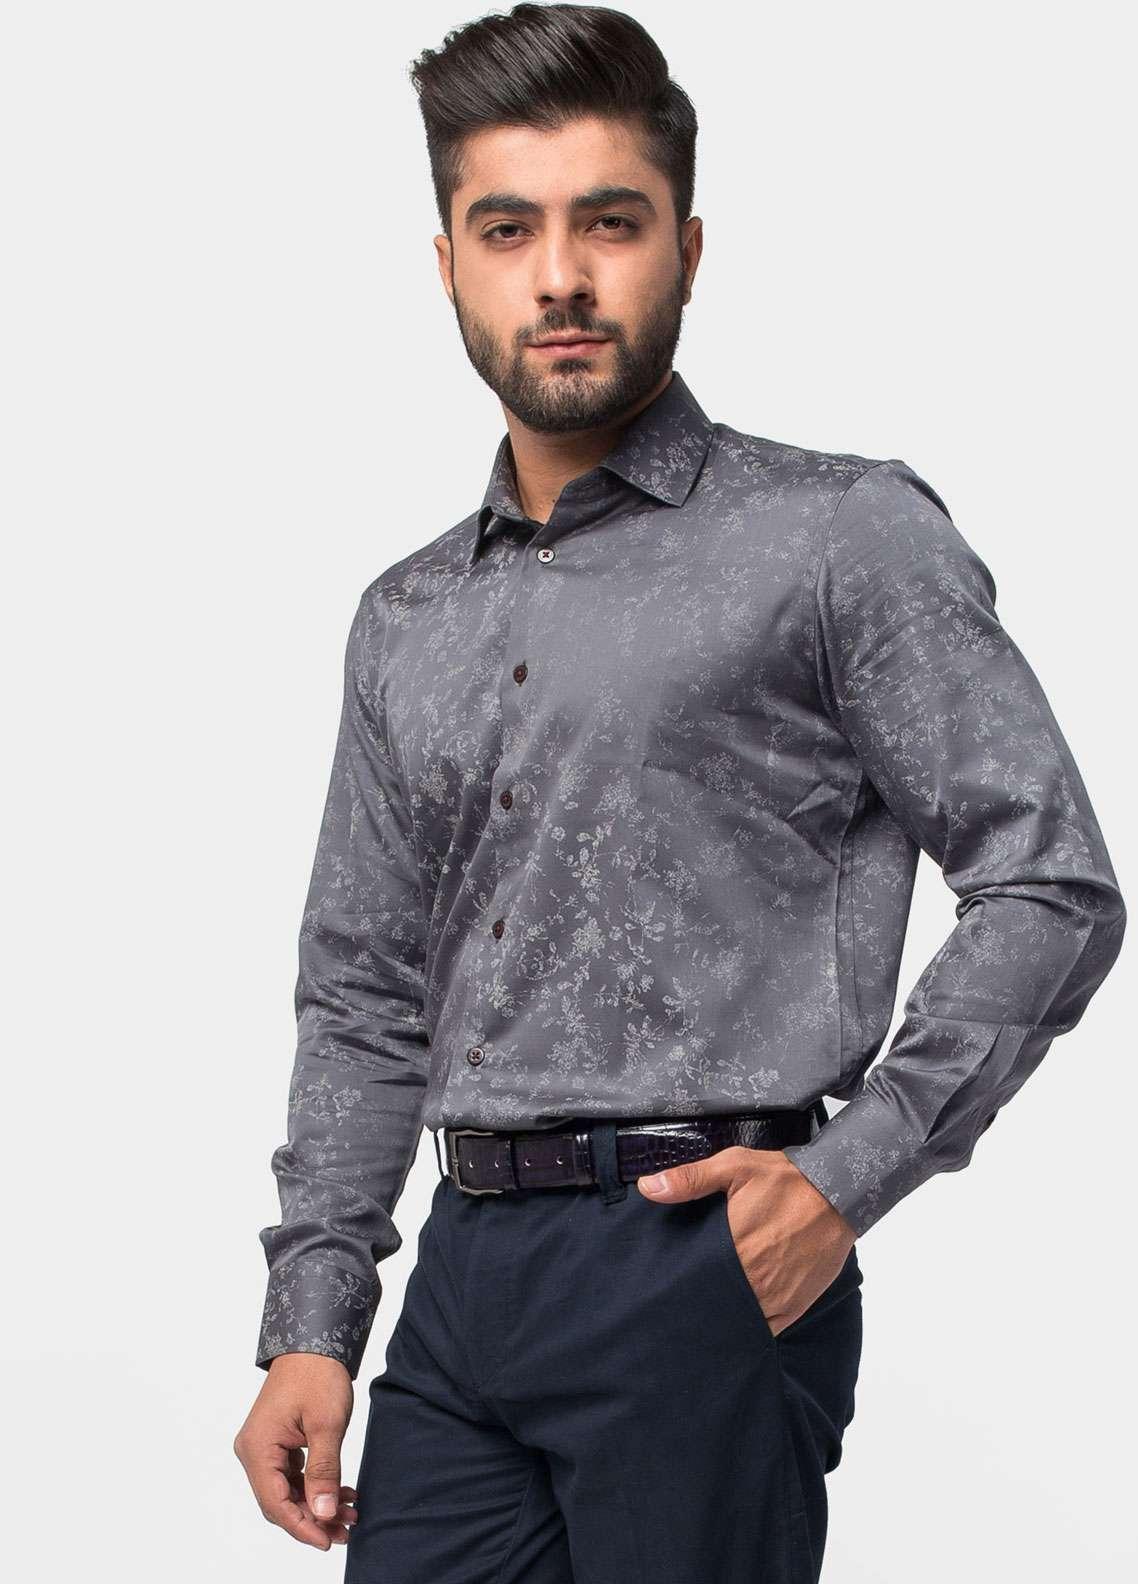 Brumano Cotton Formal Men Shirts - Grey BRM-765